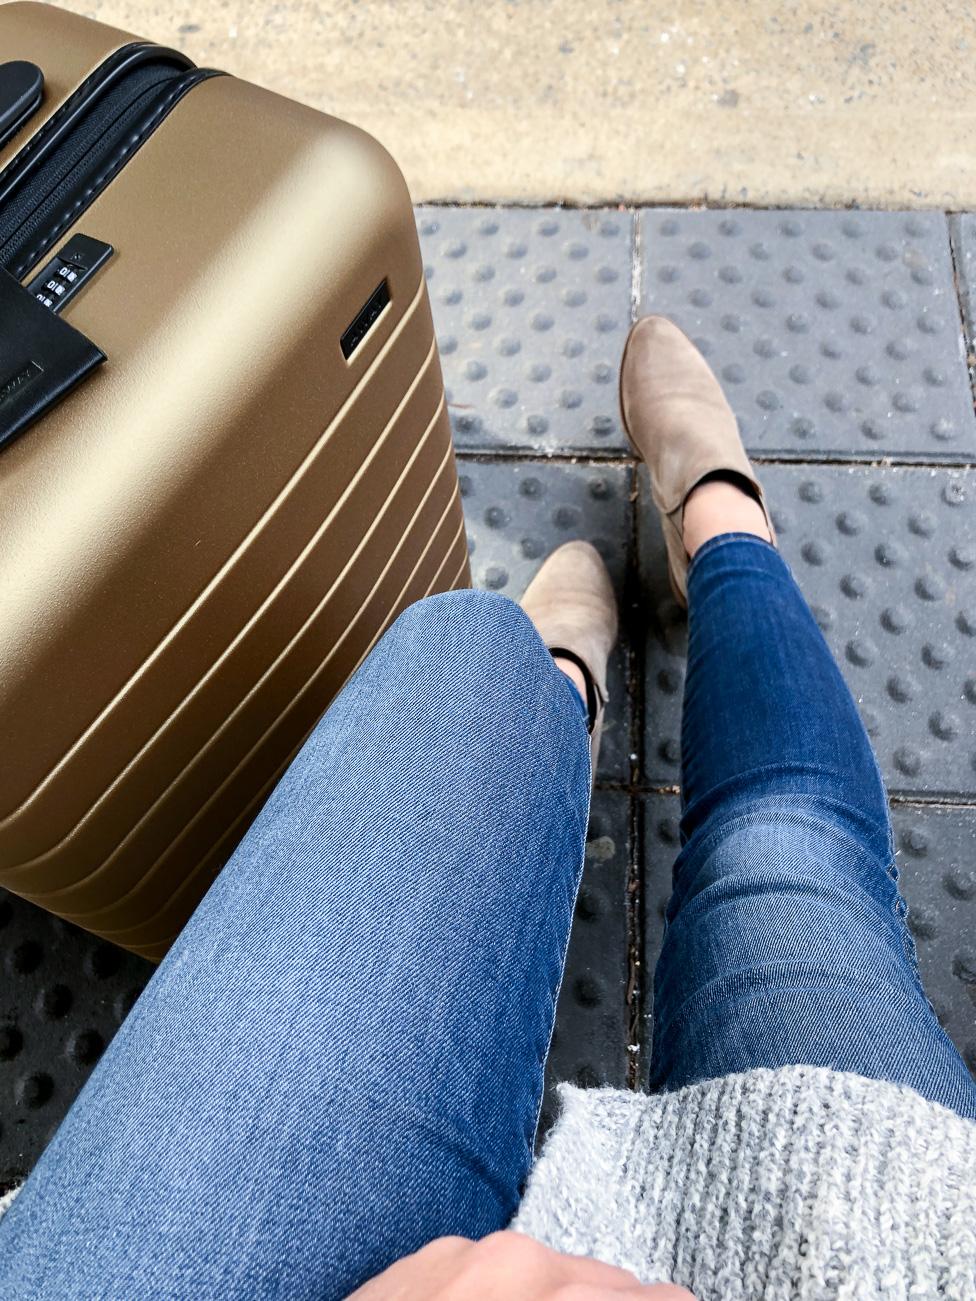 2017 Travel Recap | Cobalt Chronicles | Washington, DC | Travel Blogger